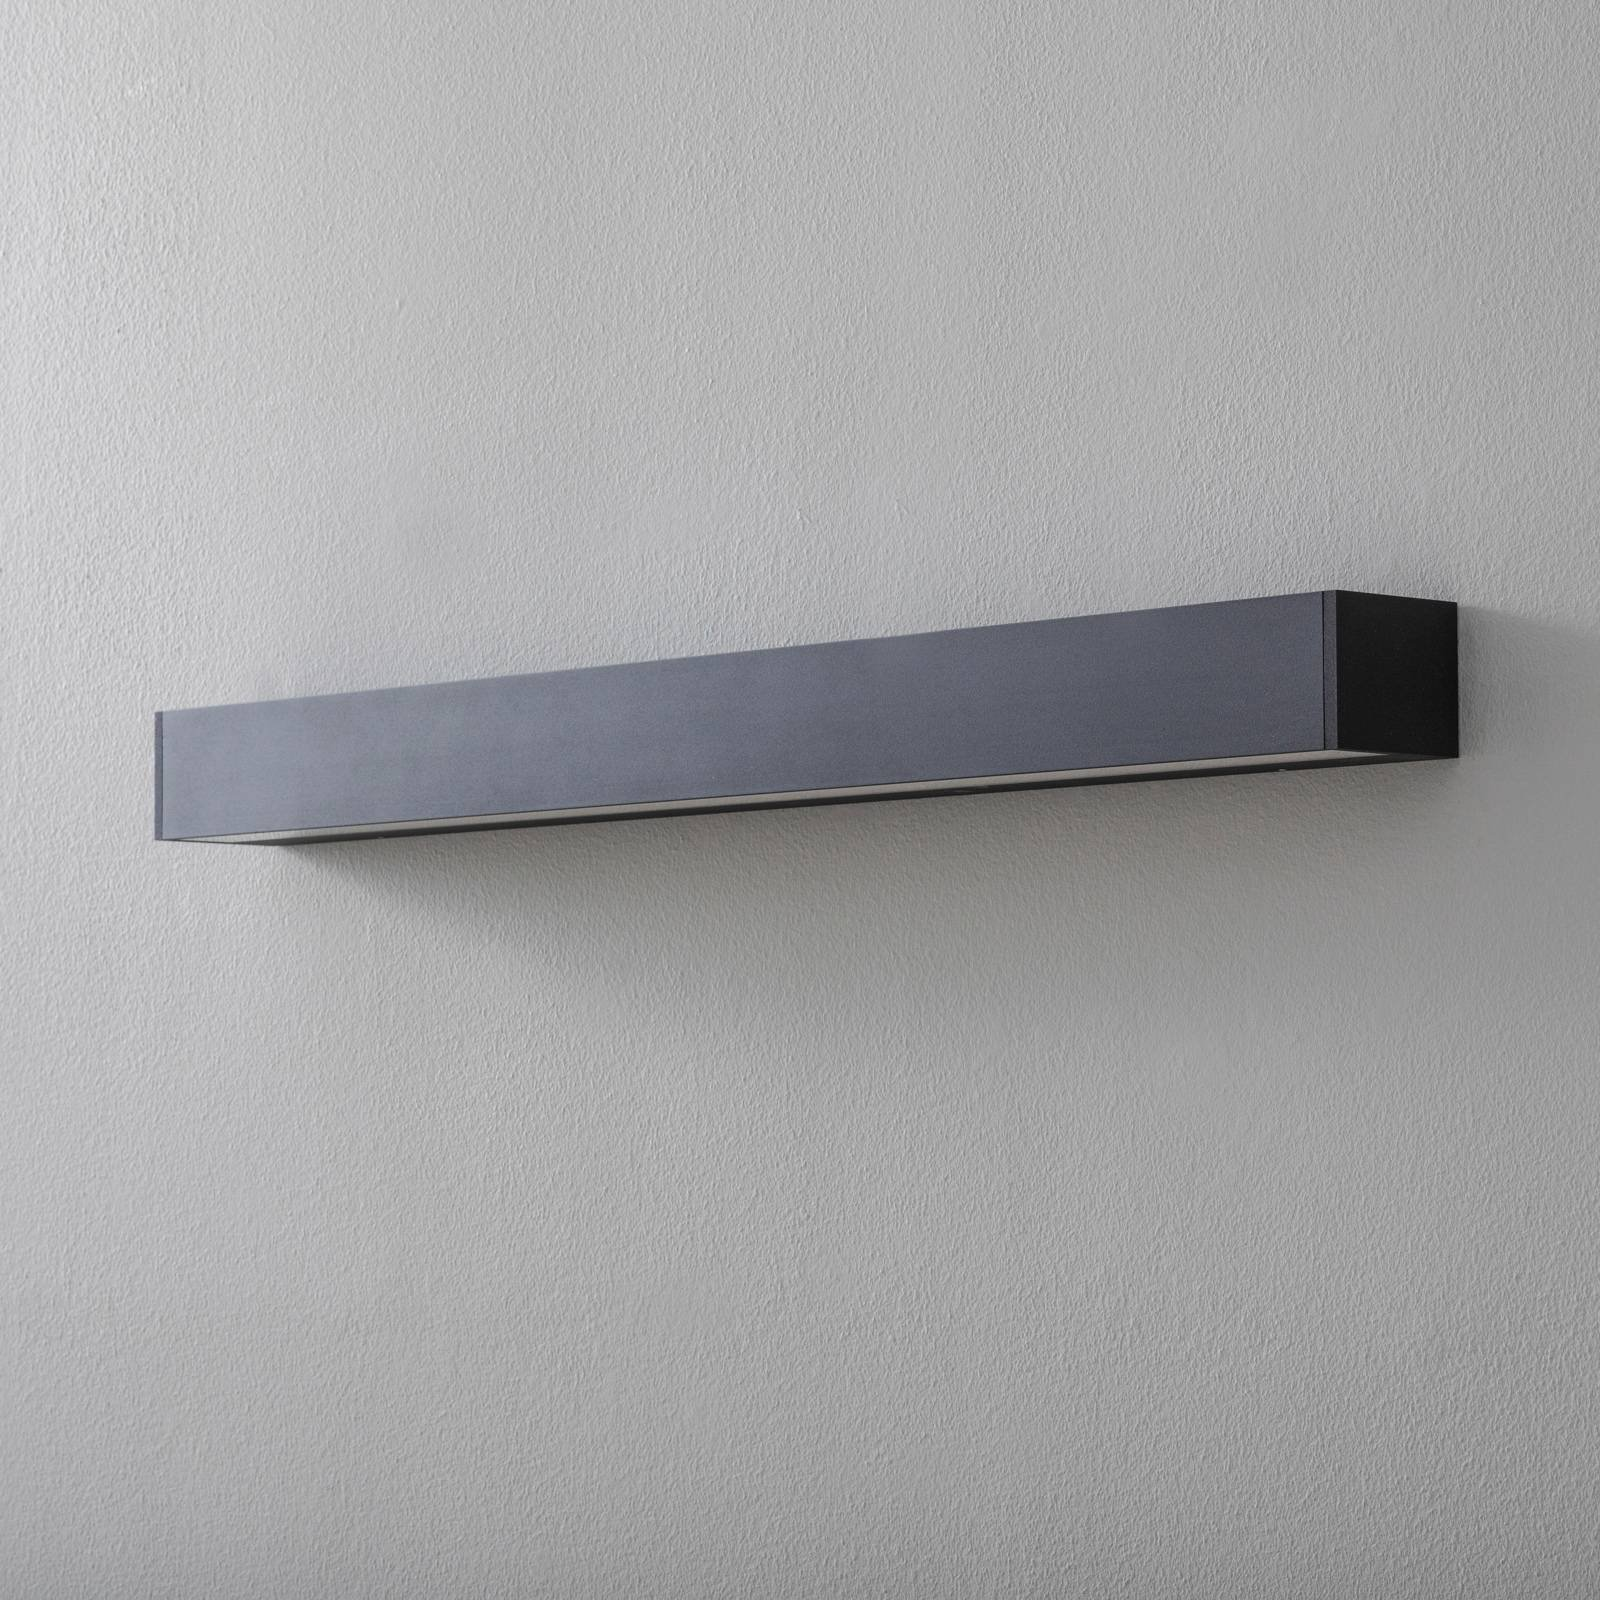 BEGA 50801 LED-vegglampe 930 svart 92 cm 5640 lm